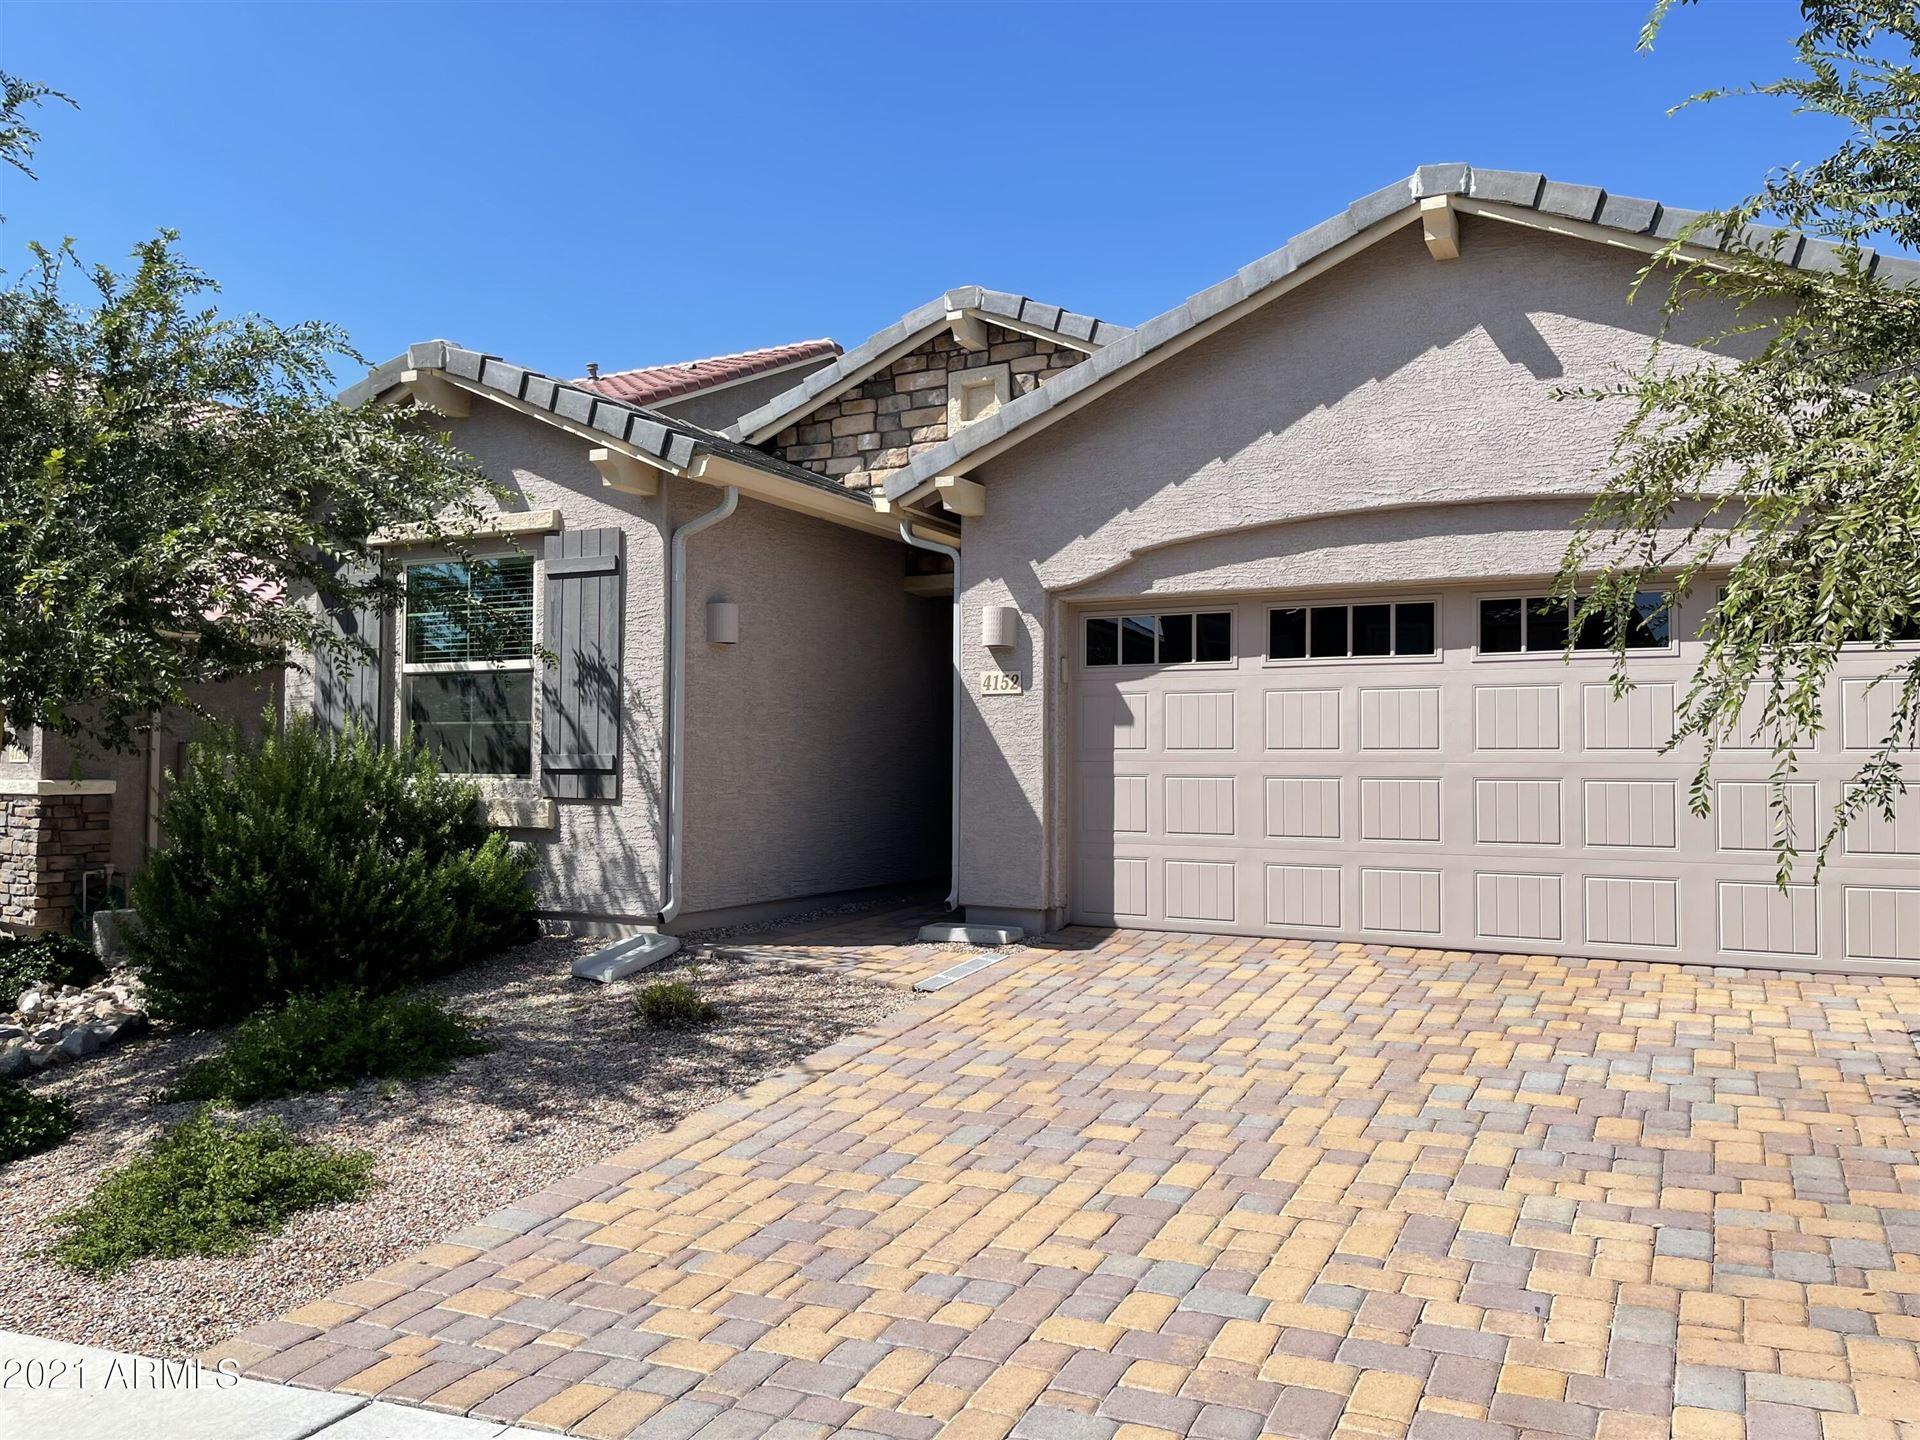 Photo of 4152 W PALACE STATION Road, New River, AZ 85087 (MLS # 6289688)